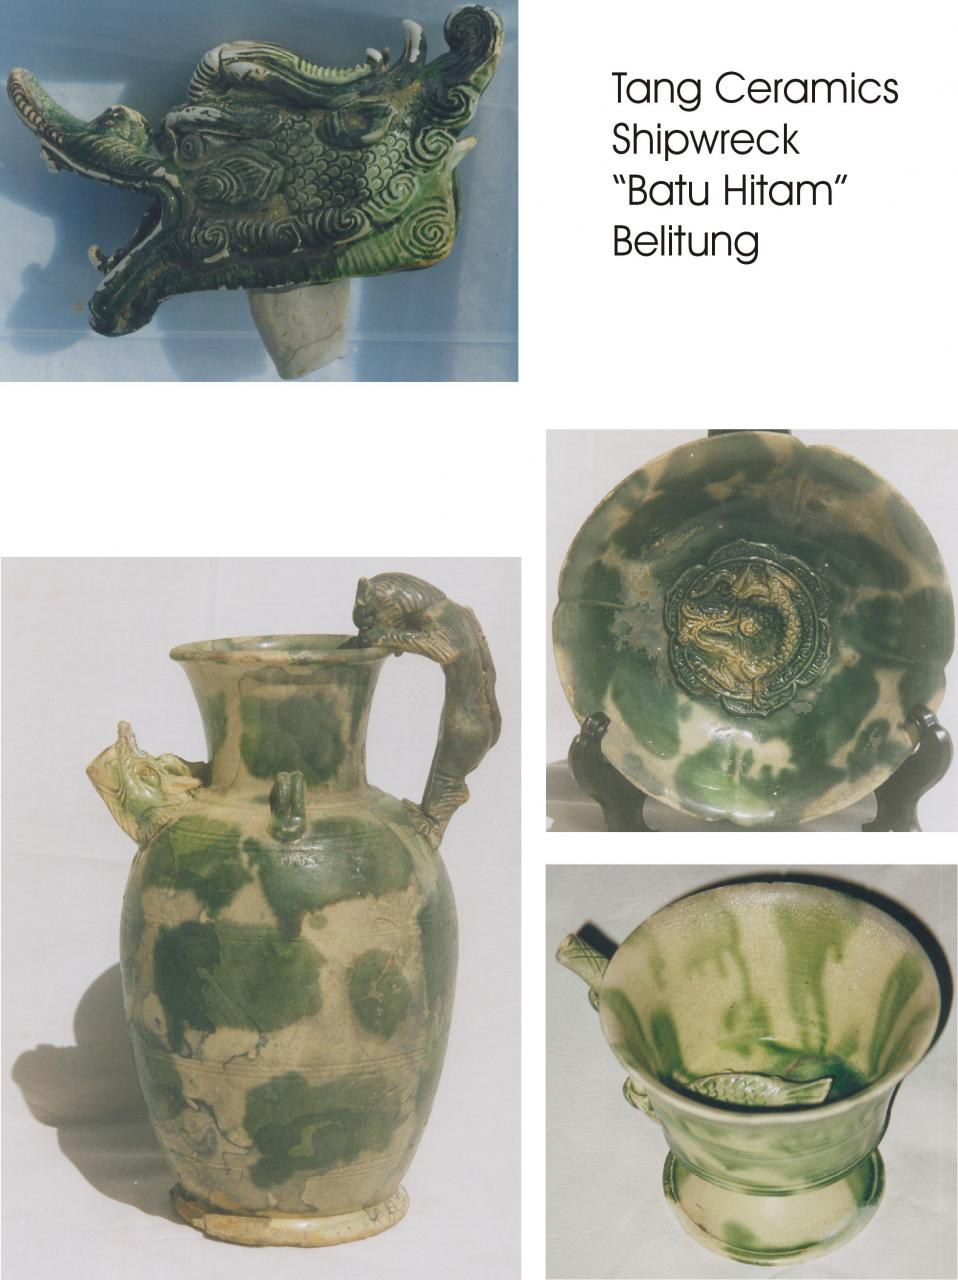 Beautiful Tang ceramics